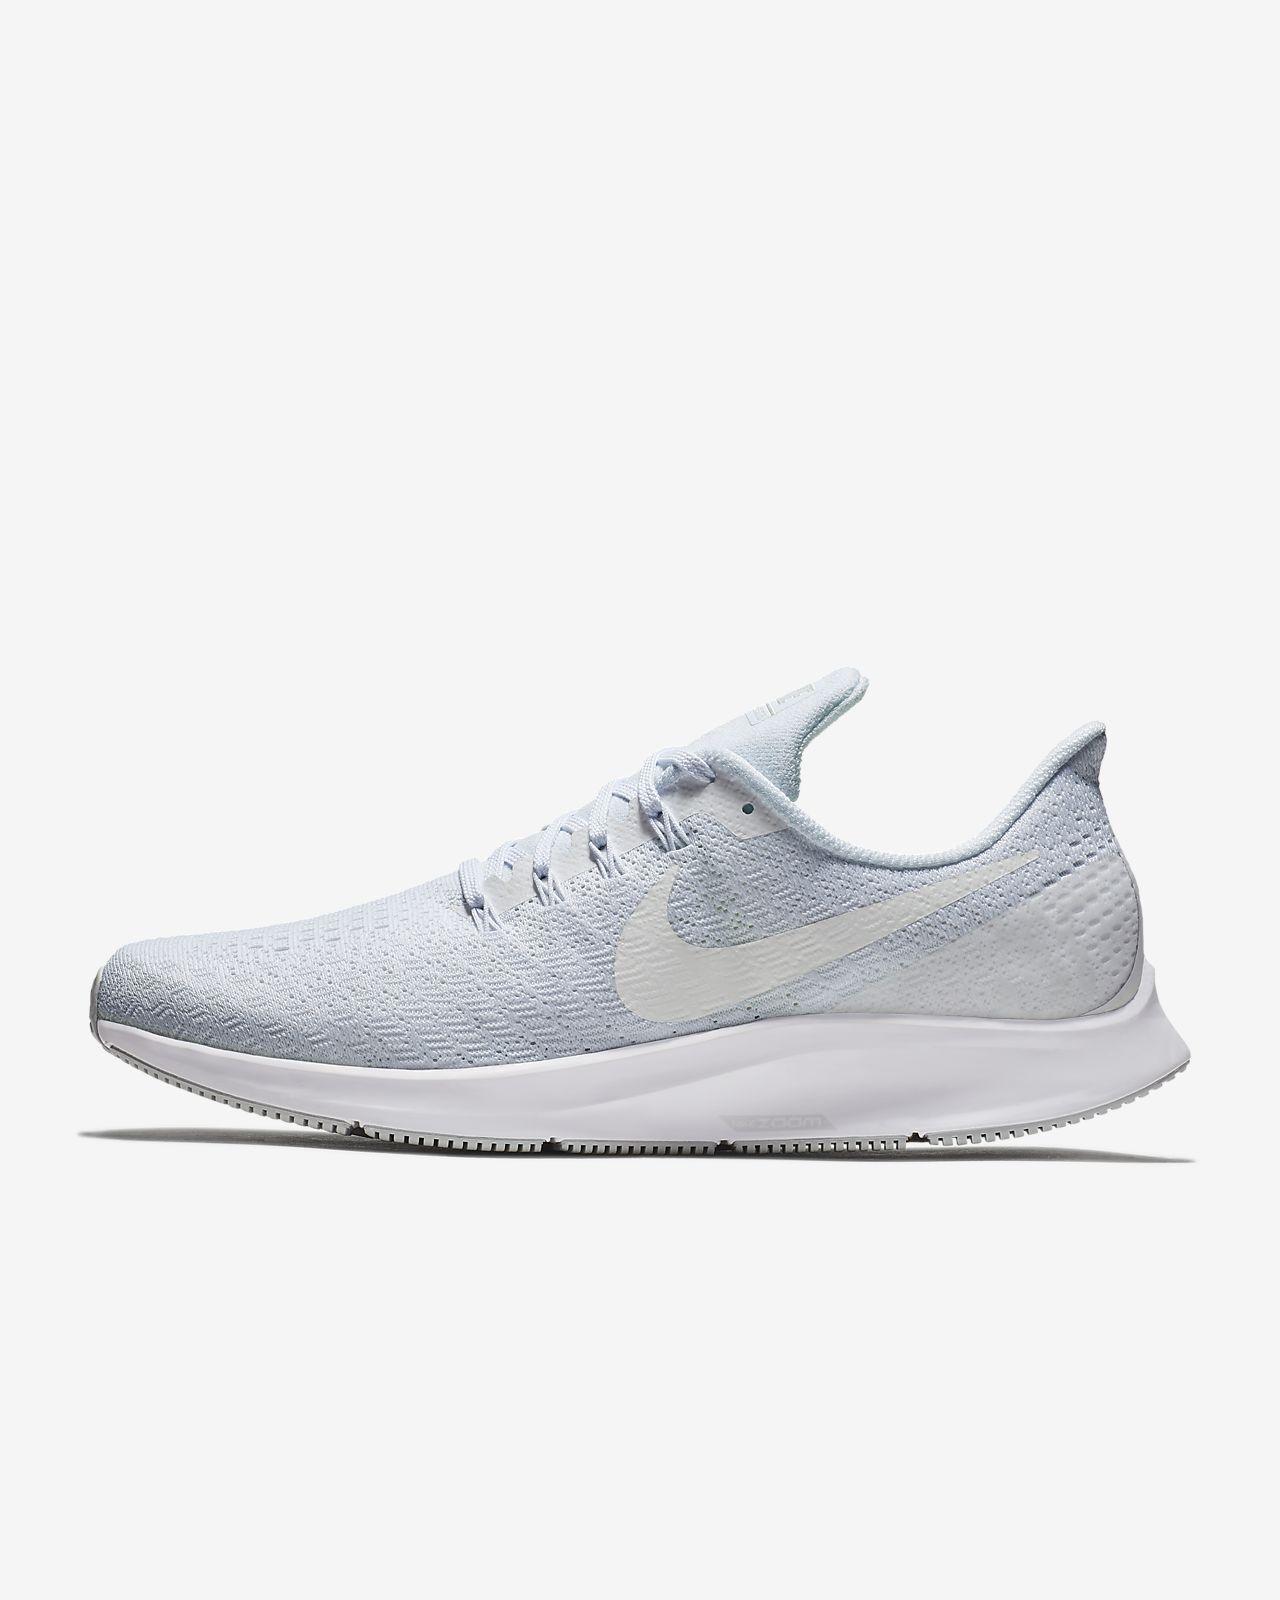 Nike Air Zoom Pegasus 35 Pure Platinum Laufschuhe Für Damen